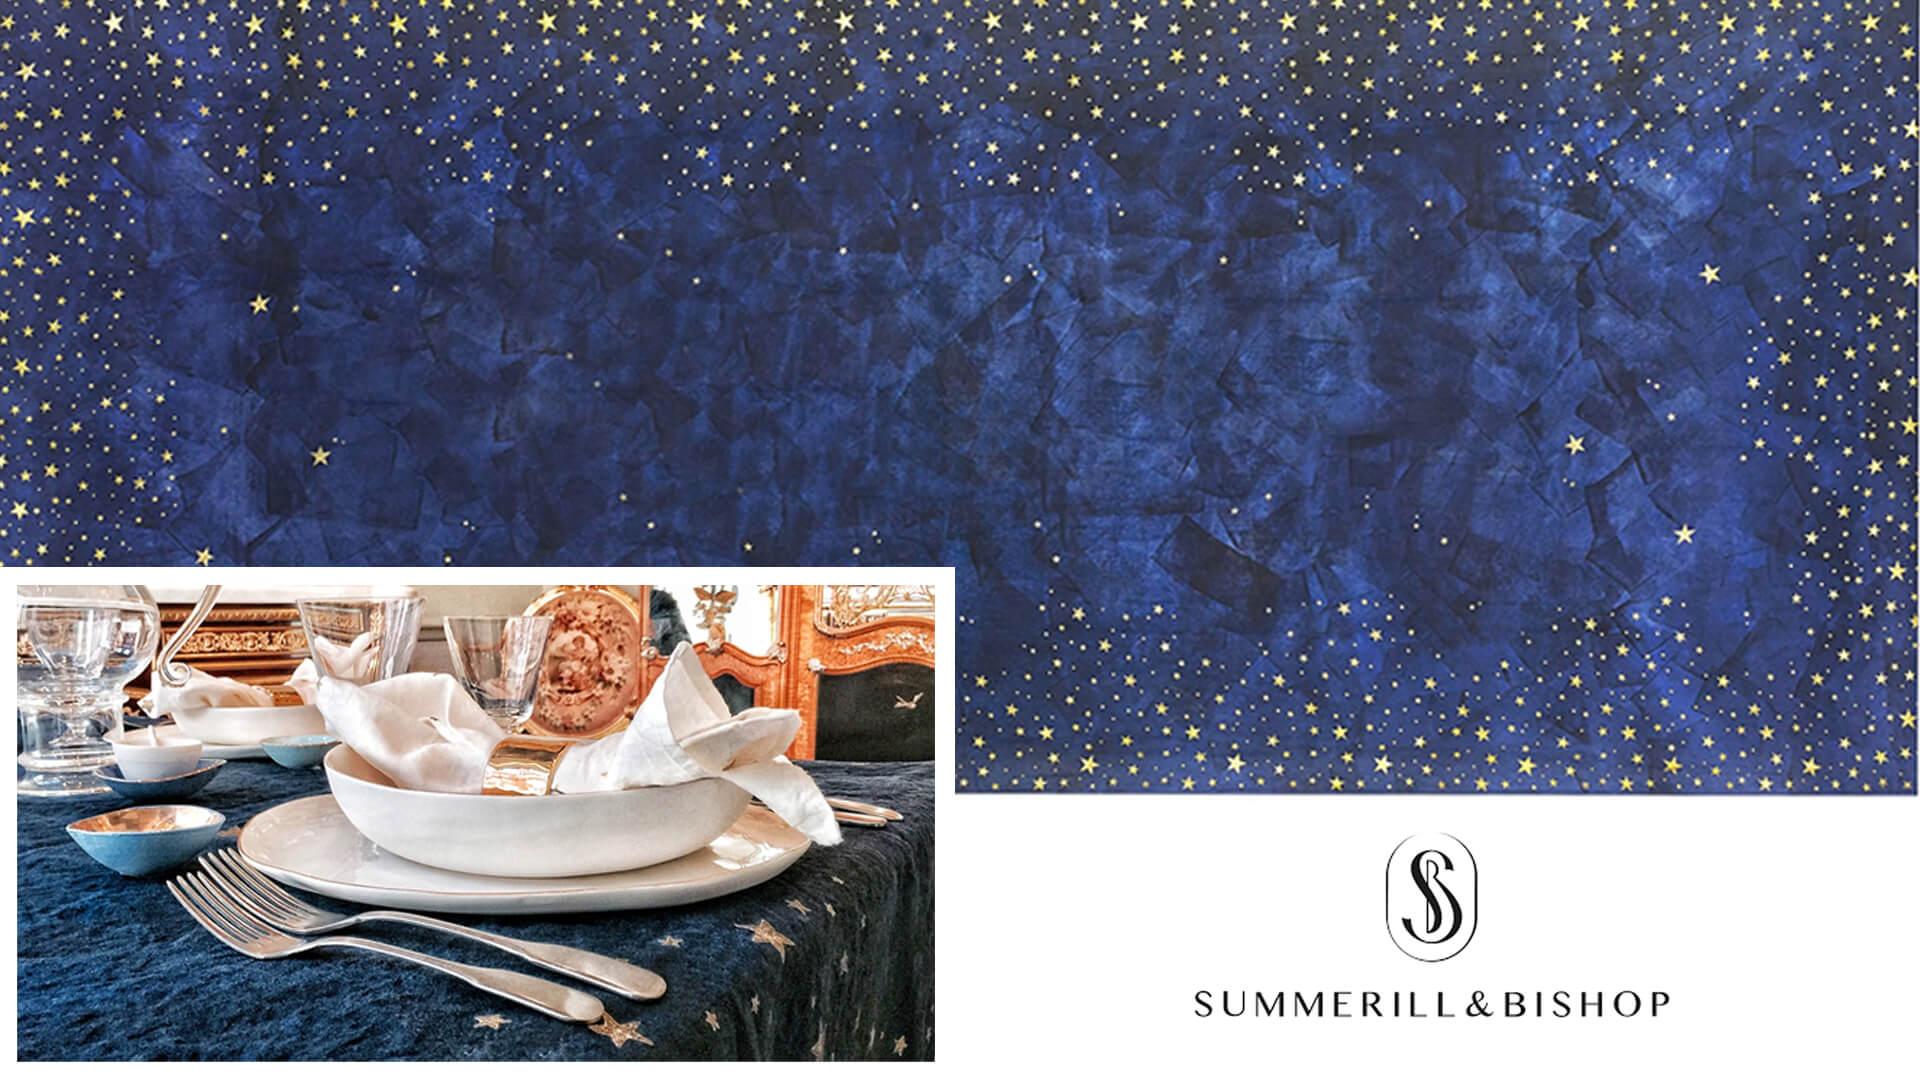 ummerhill and Bishop tablecloth